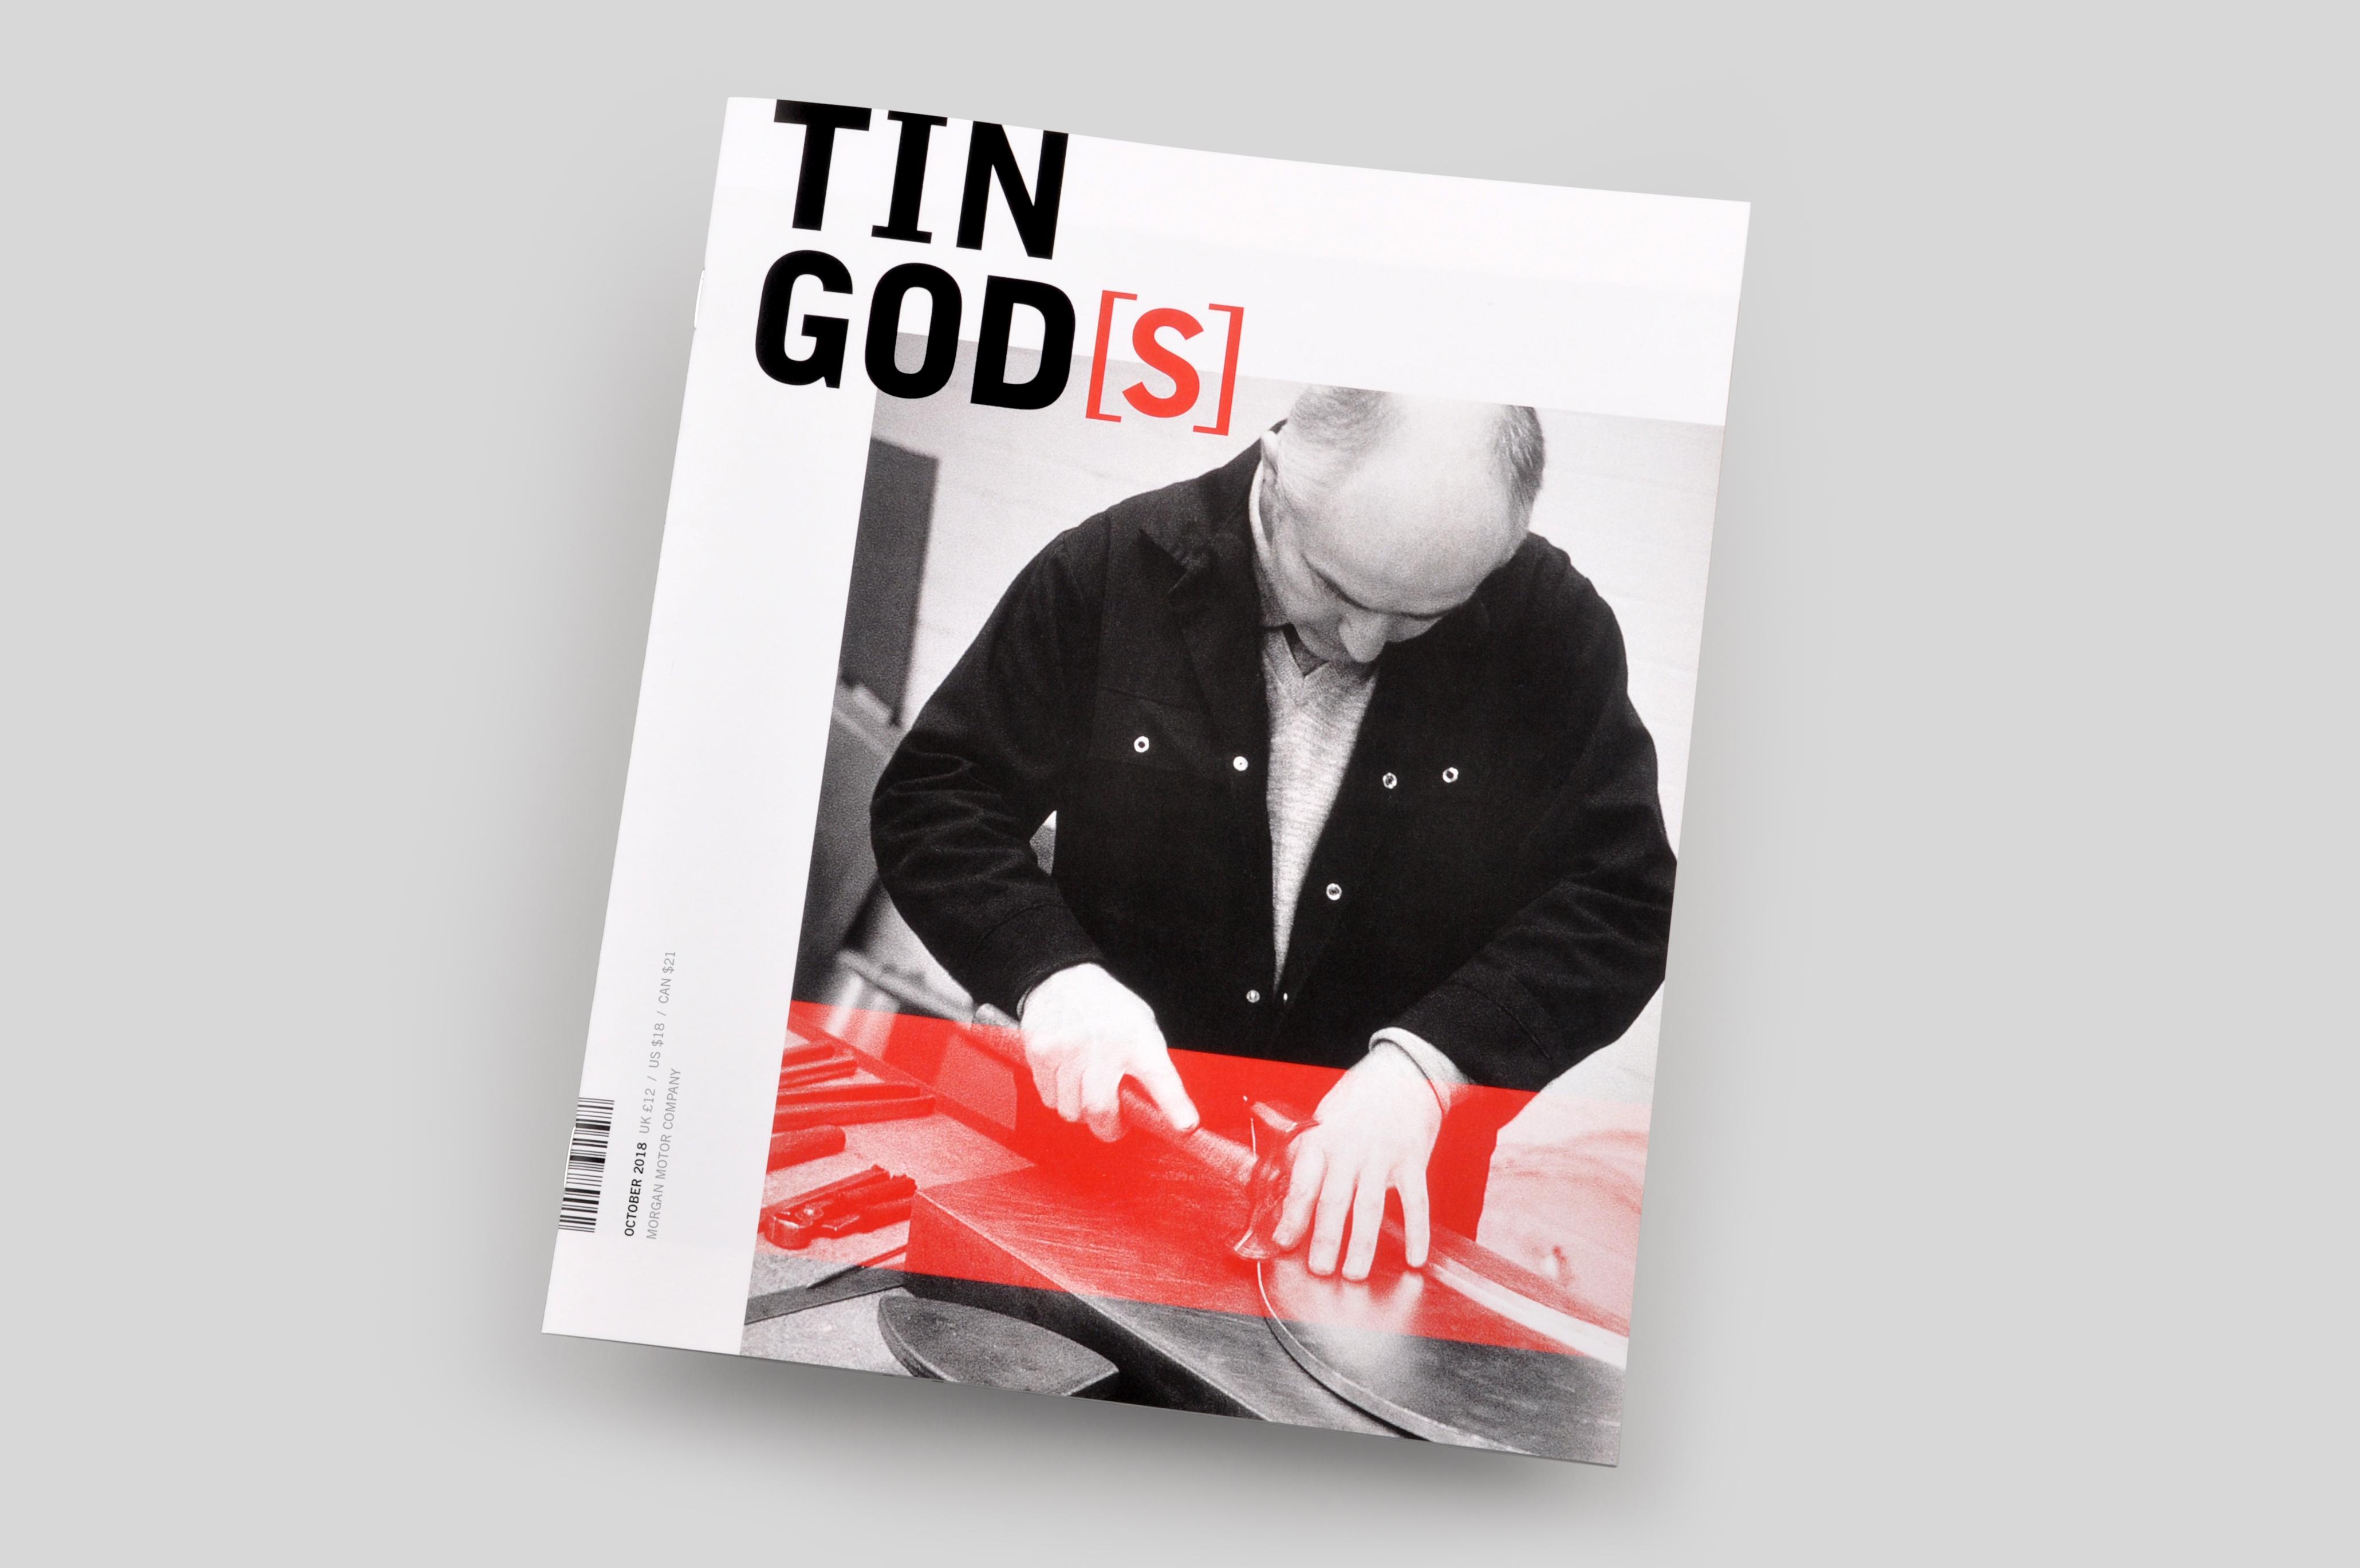 Tin God[s]